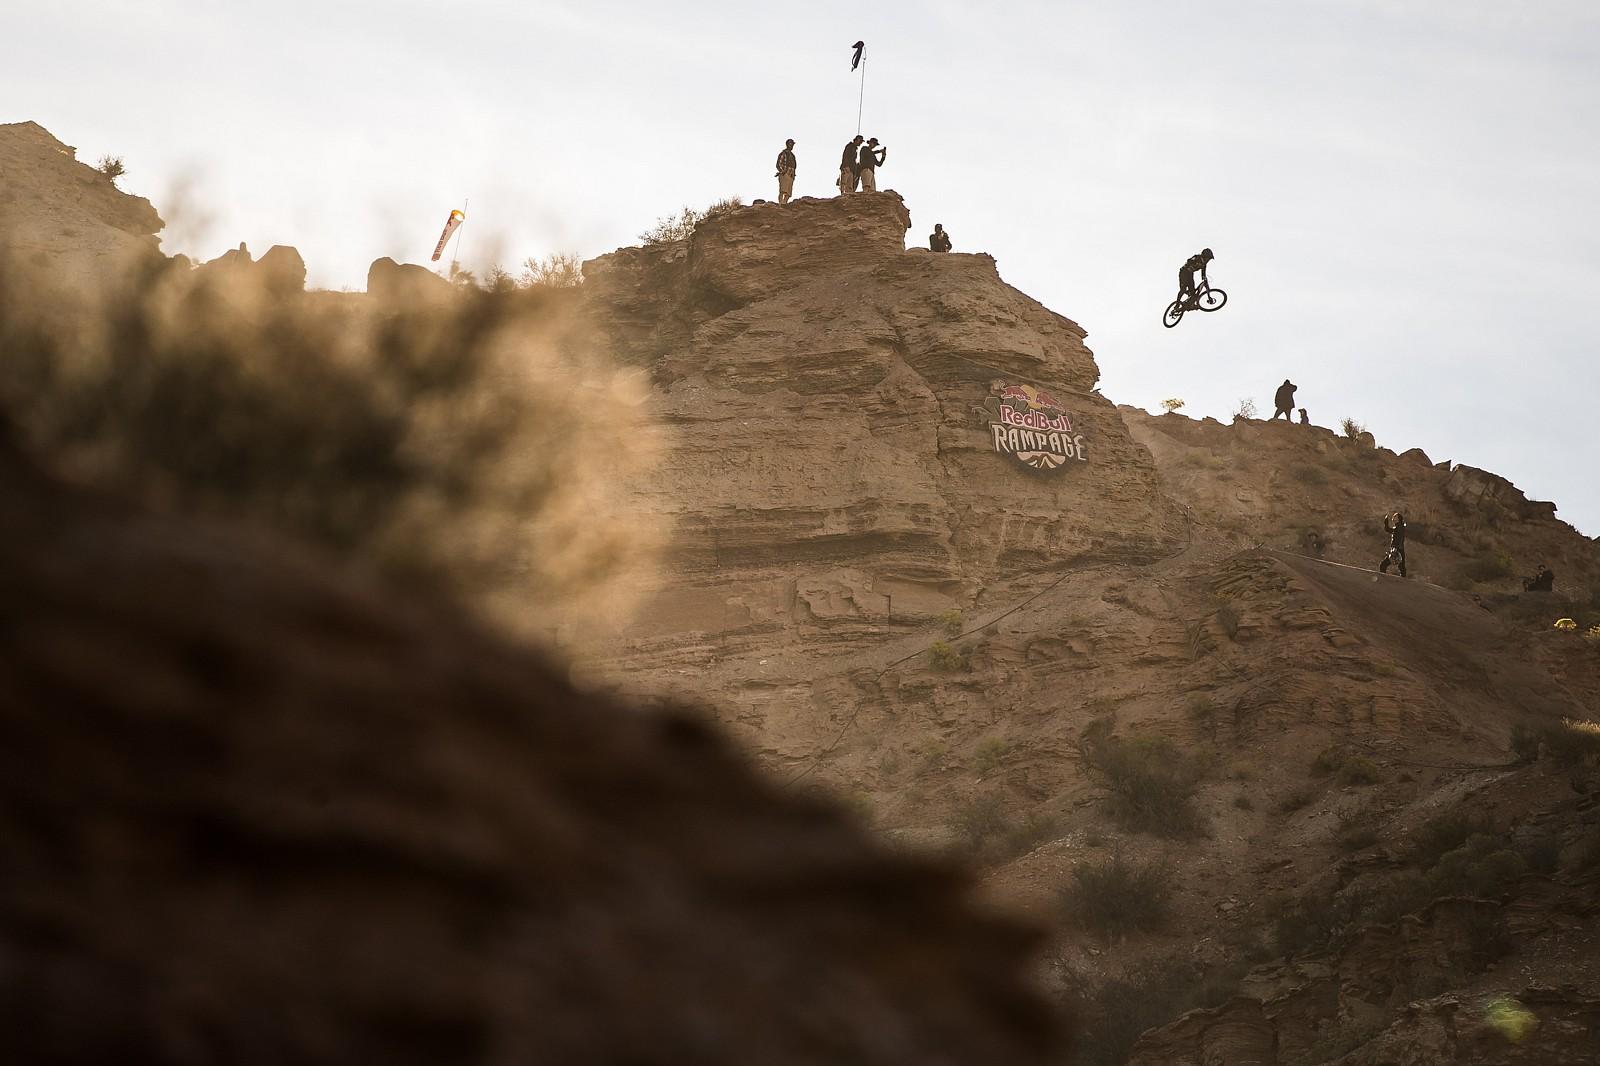 XXL Hucking at Rampage - More Rampage Hucking from @maddogboris - Mountain Biking Pictures - Vital MTB